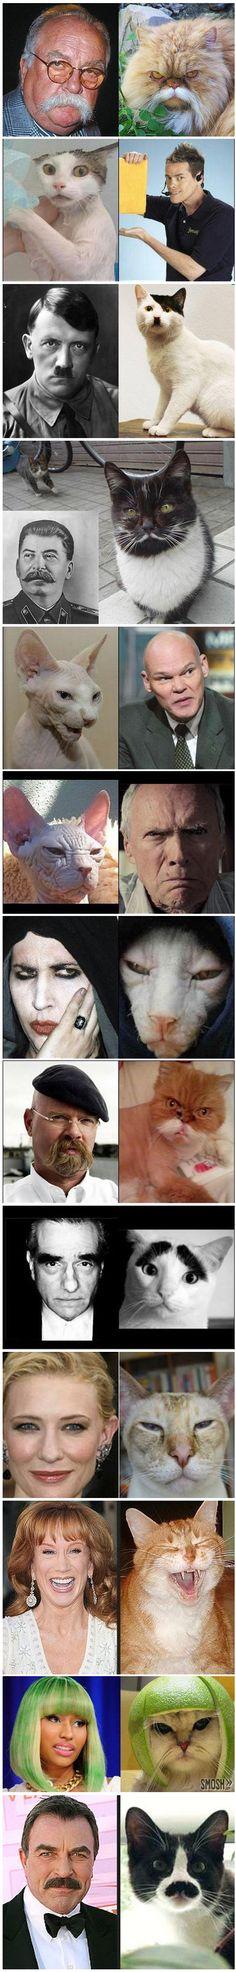 13 Cats That Look Like Celebrities...haha!!